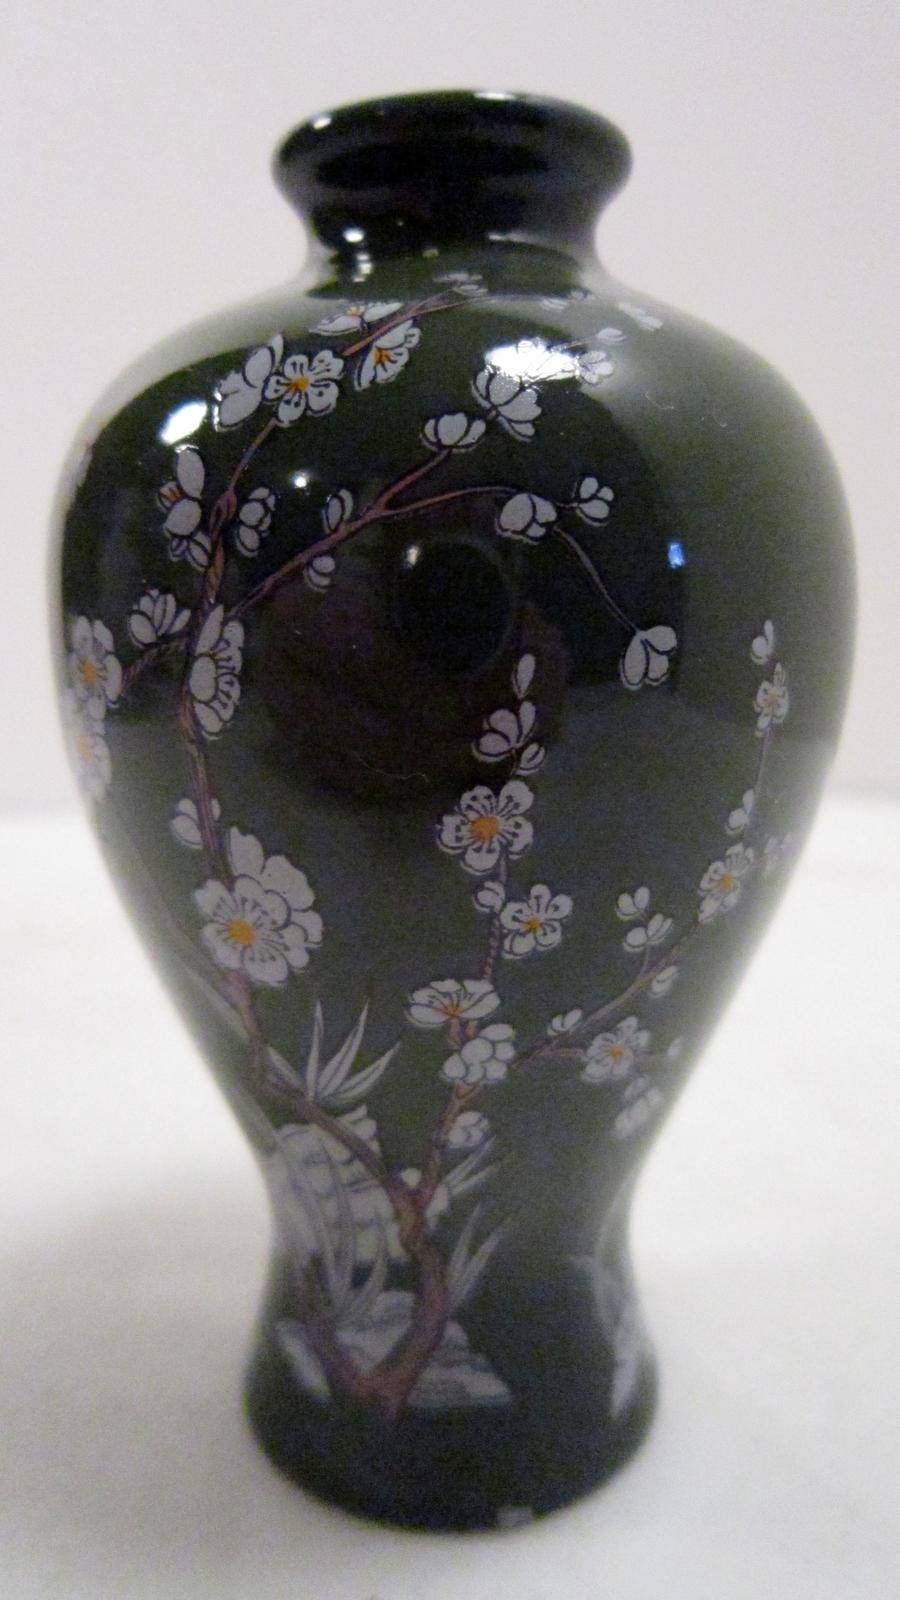 Franklin mint vase 18 listings green baluster vase 1980 franklin mint treasures imperial dynasties 943 reviewsmspy